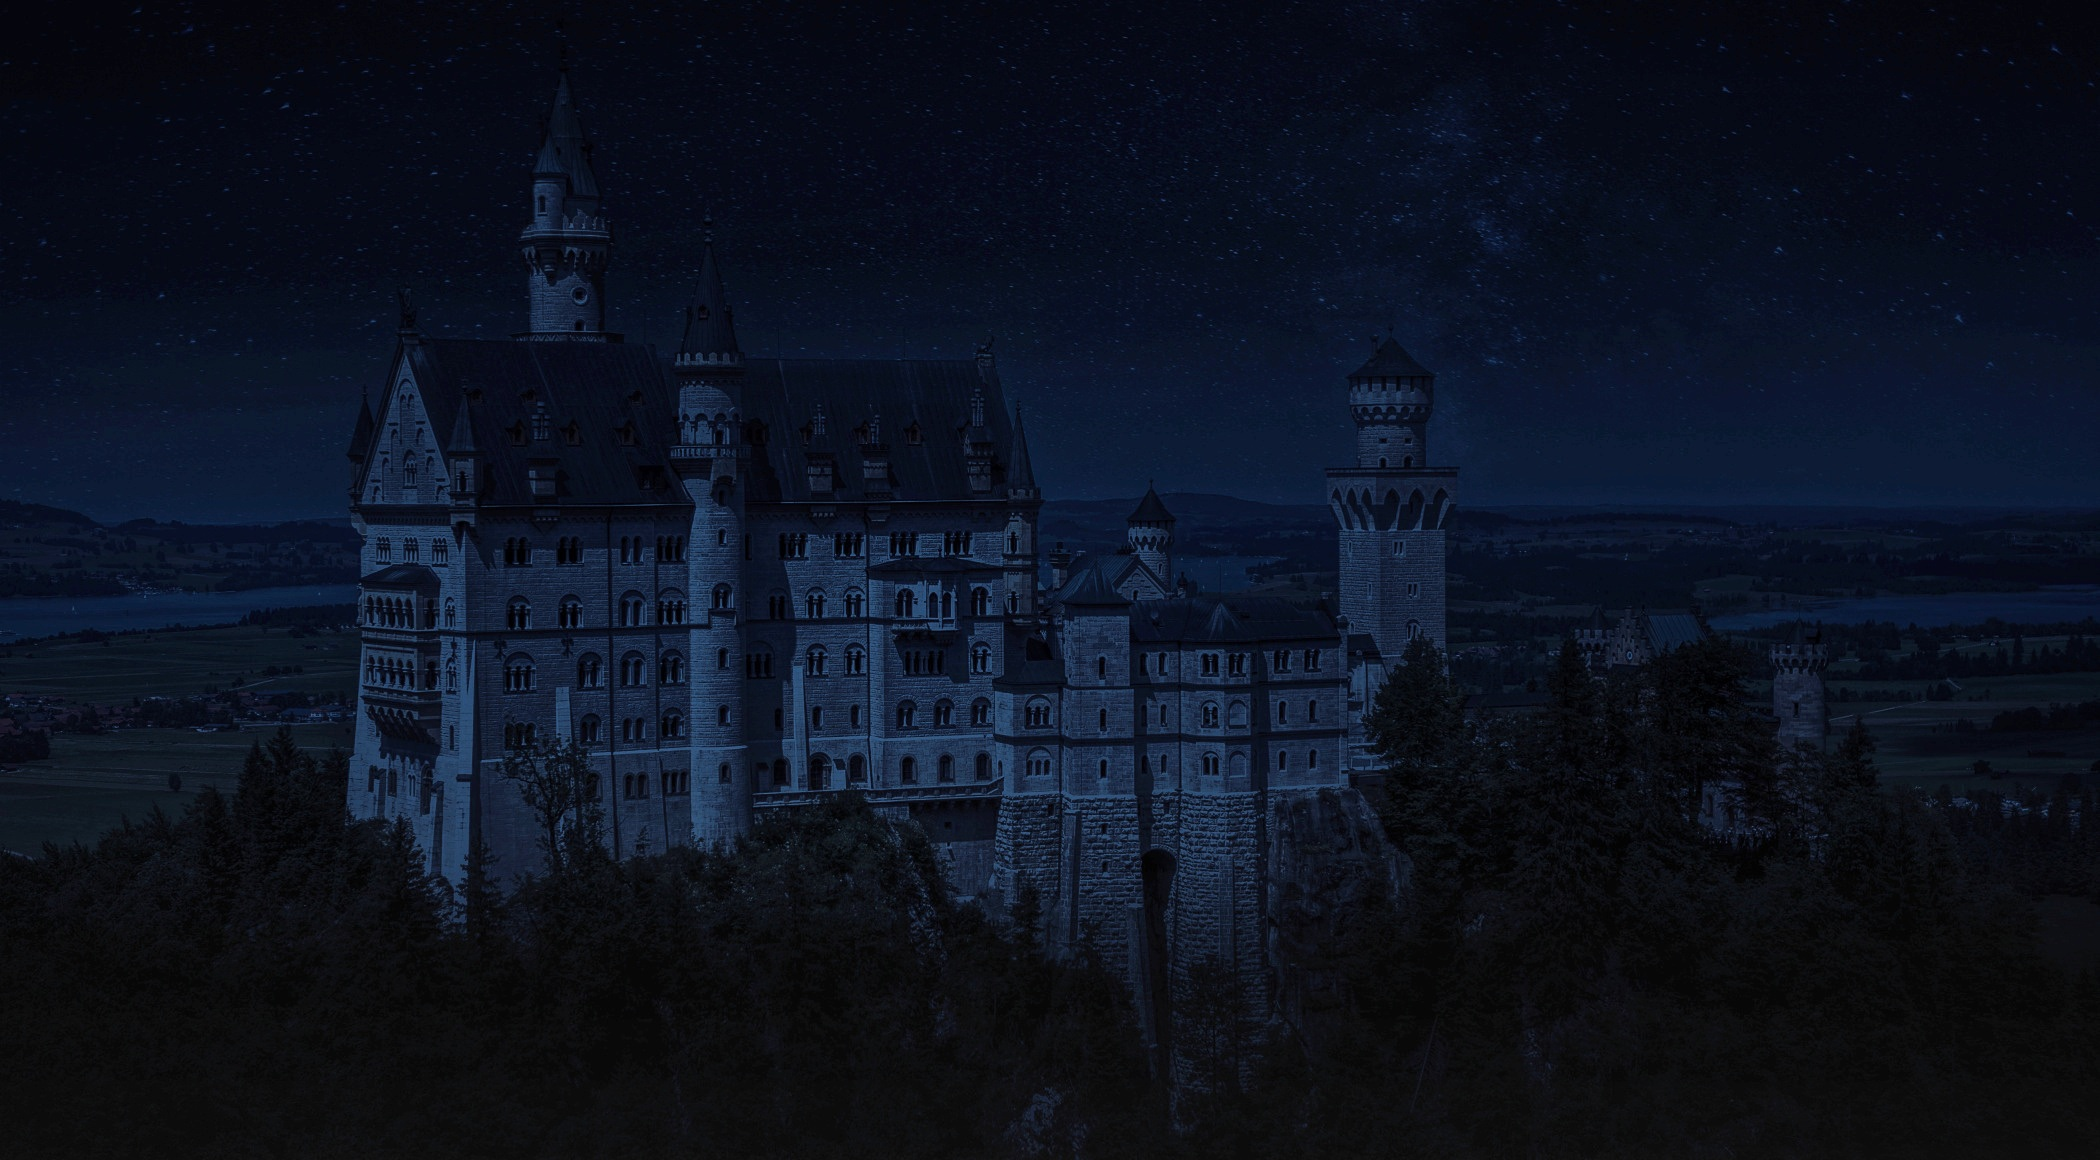 Black Dog Wallpaper Free Stock Photo Of Castle Castle At Night Castle